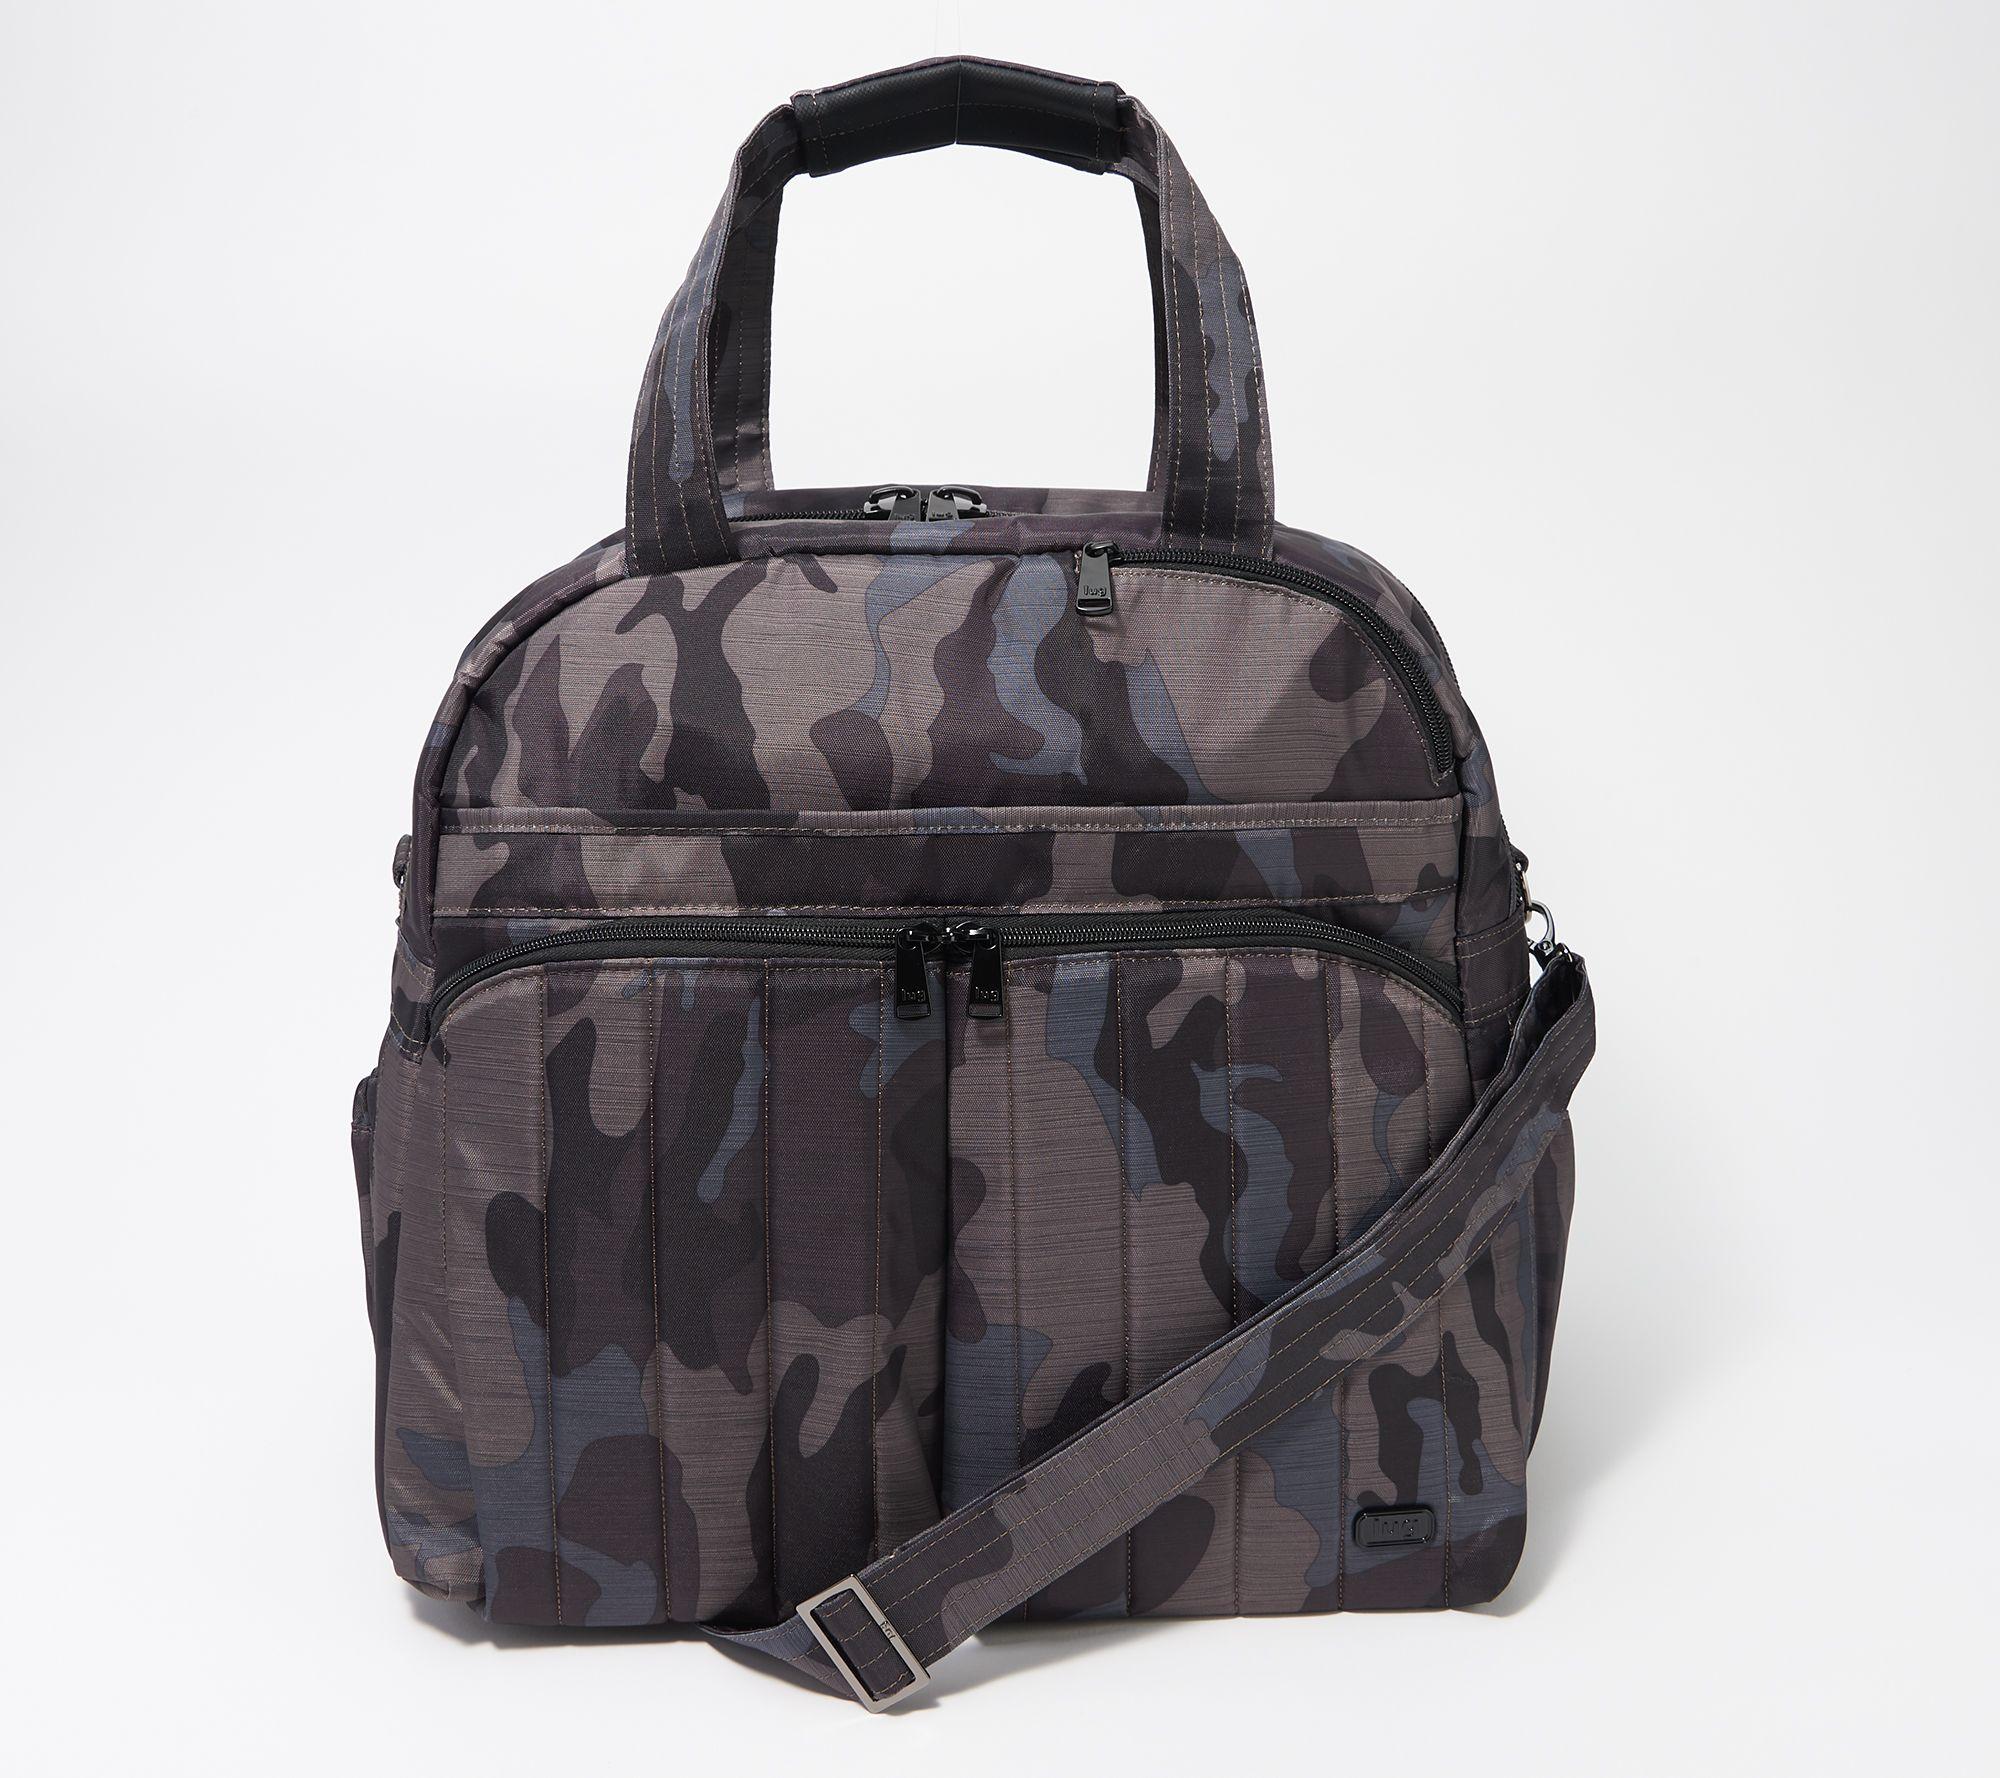 Im A Ninja Travel Carry-on Luggage Weekender Bag Overnight Tote Flight Duffel In Trolley Handle